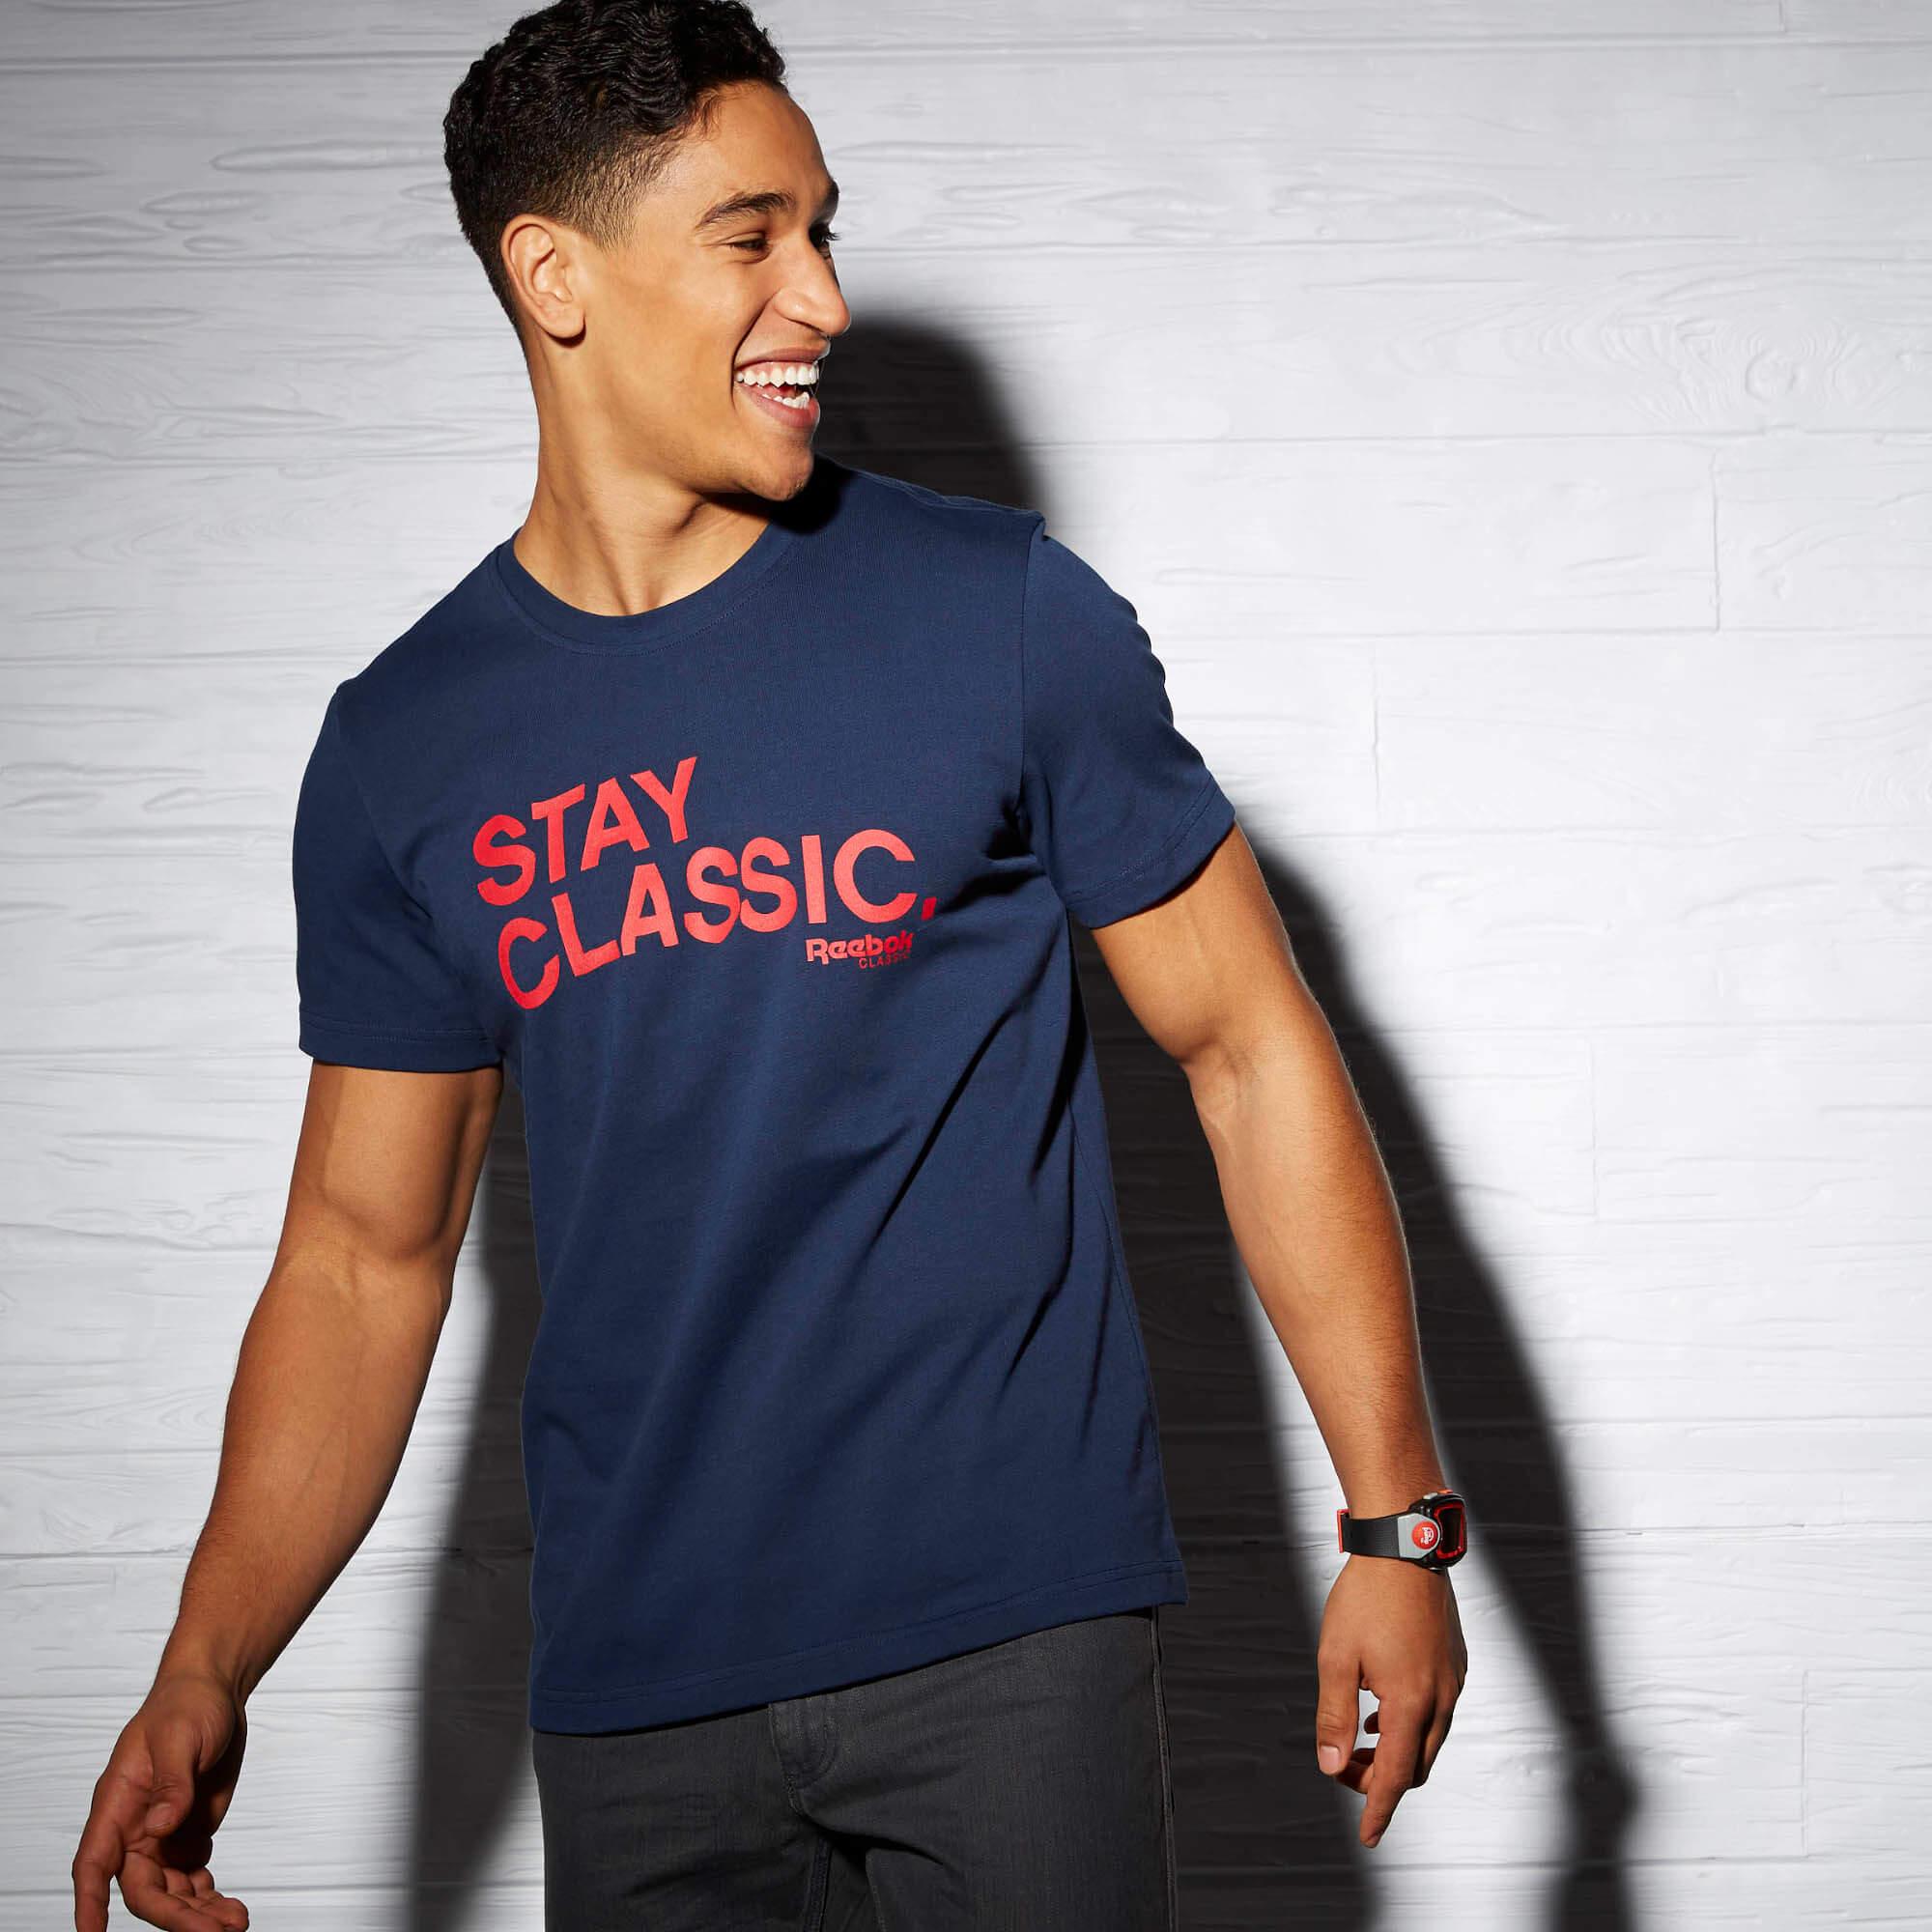 Camiseta Reebok Stay Classic Estilo Retrô Urban Wear Br8600